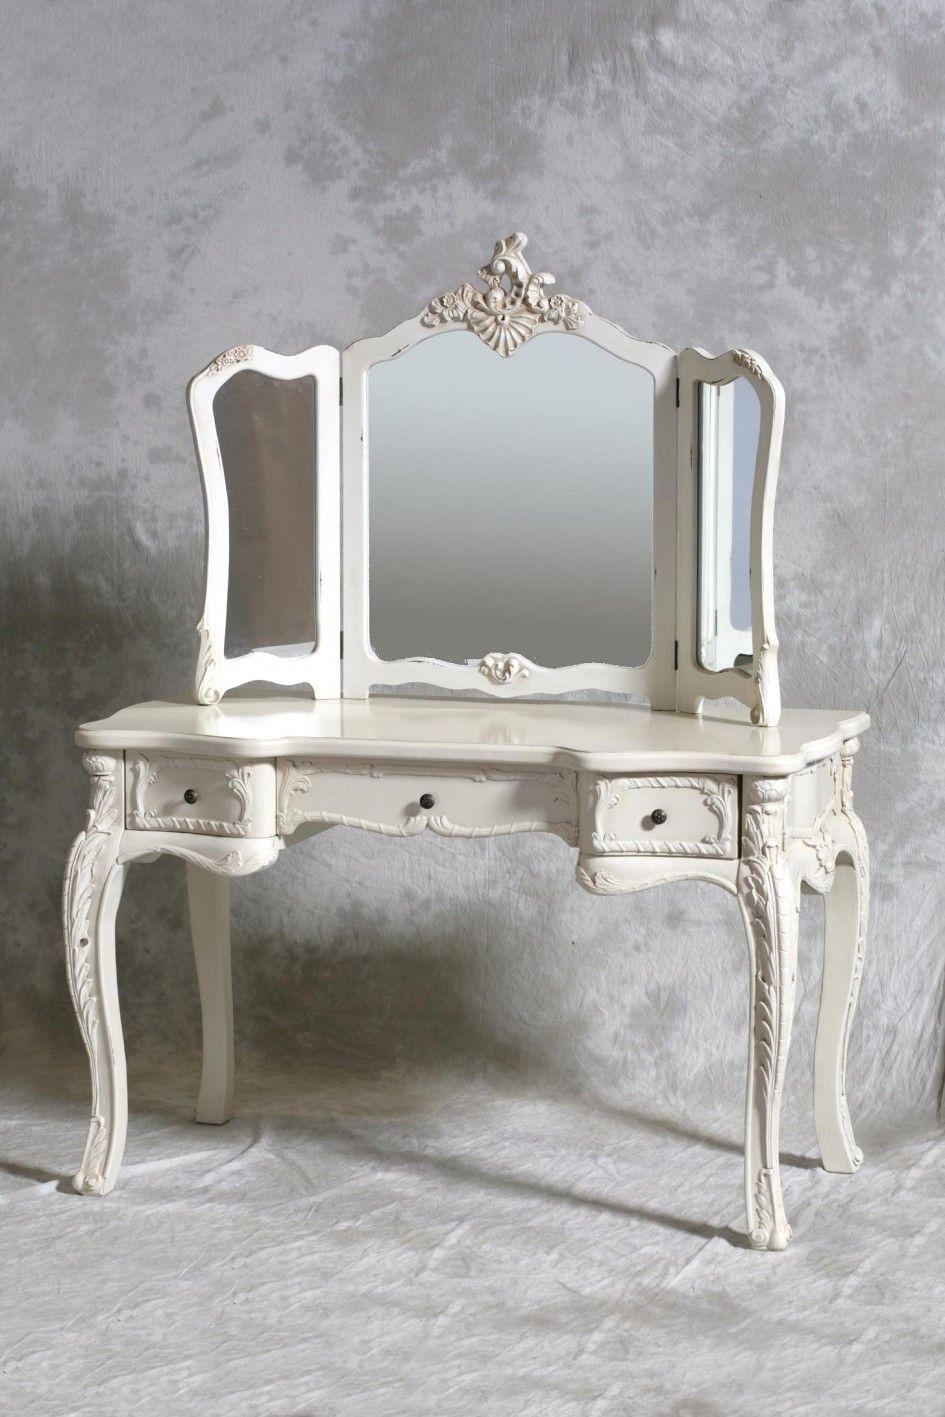 Vanity Dressing Table With Mirror Decoration Fine Looking Antique Dressing Table With Cool Three Mirror Schminktisch Vintage Spiegel Waschtisch Schminktisch